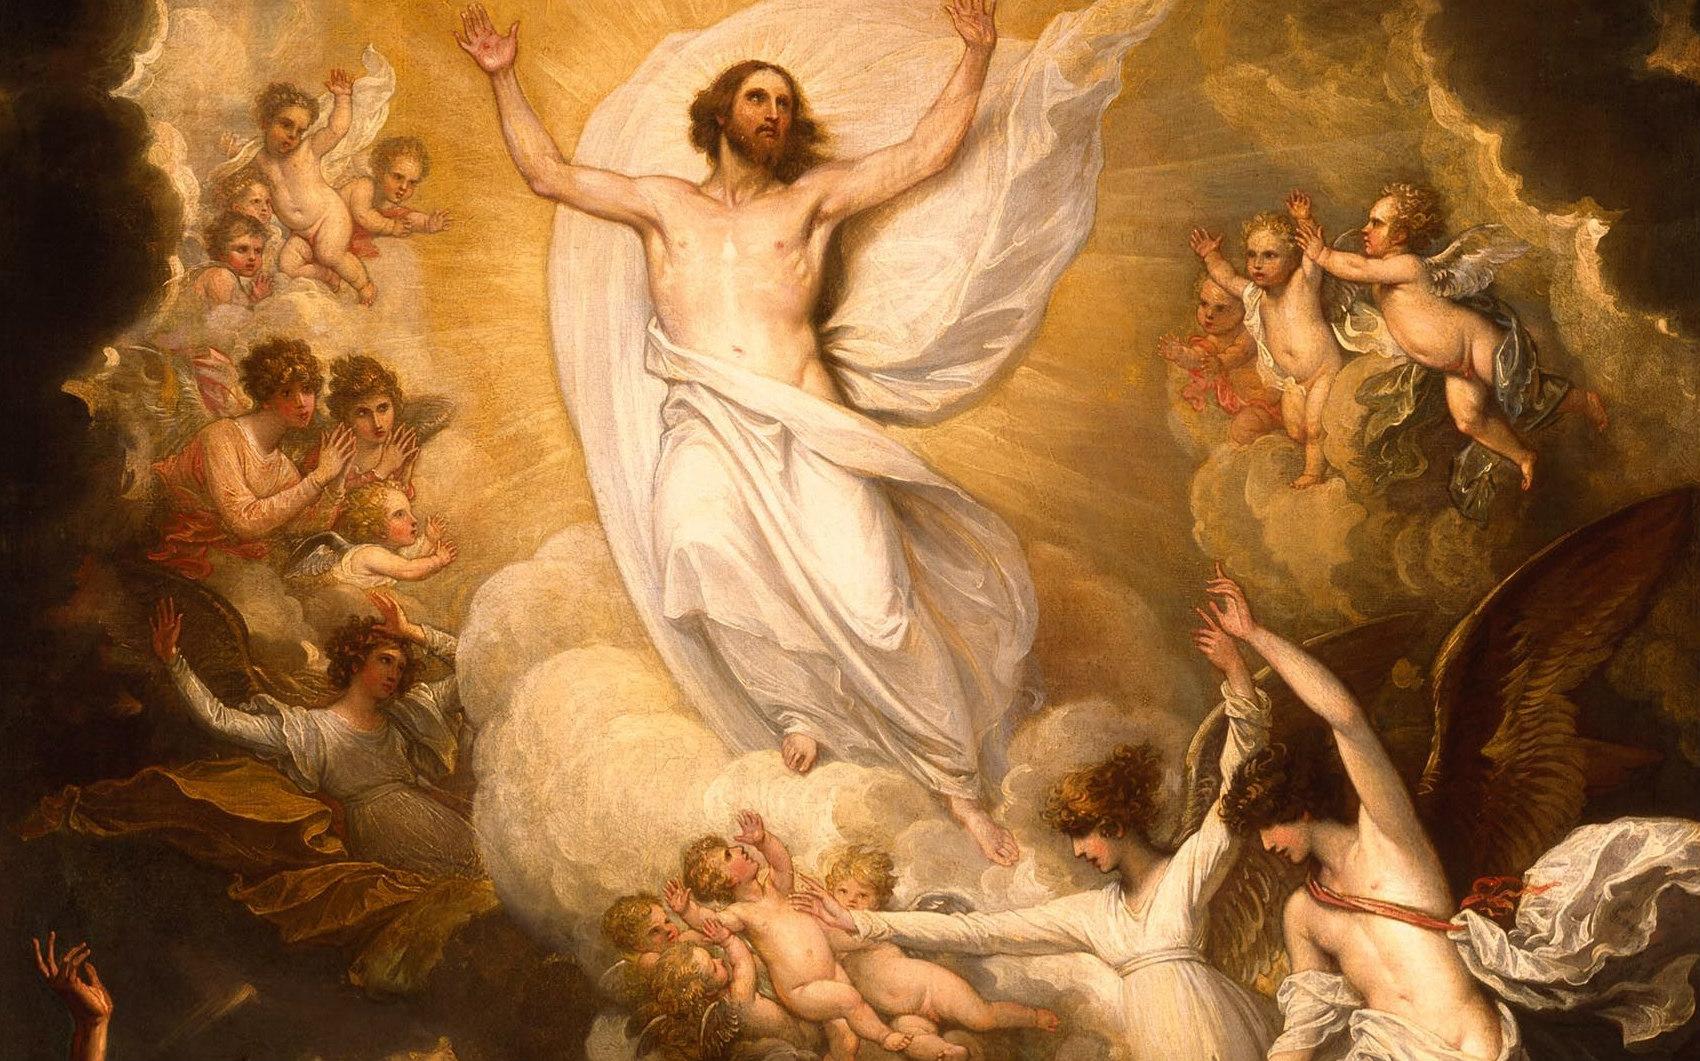 Paște binecuvântat! Áldott húsvétot!